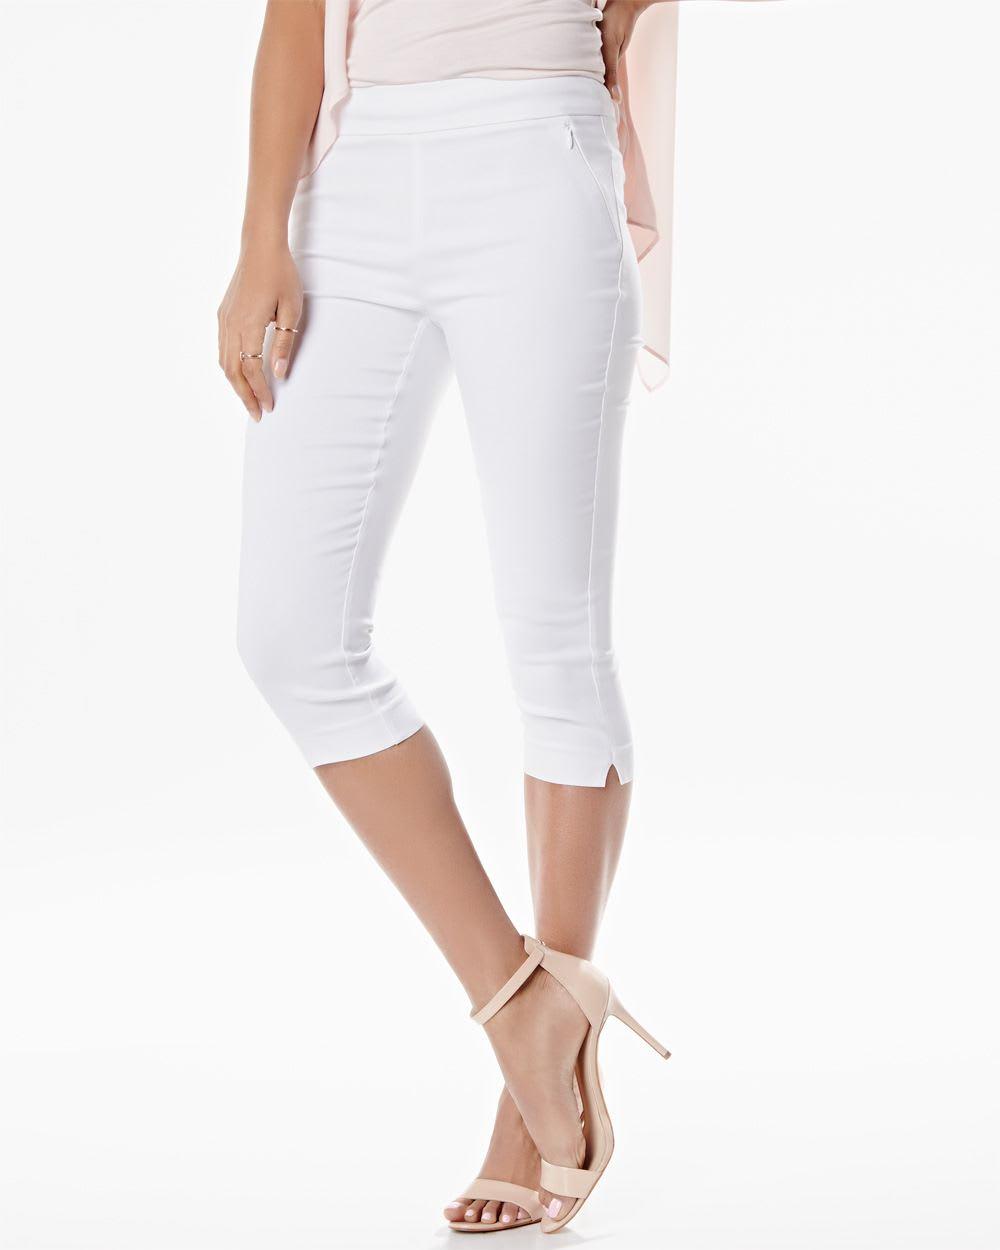 White Stretch Capri Leggings